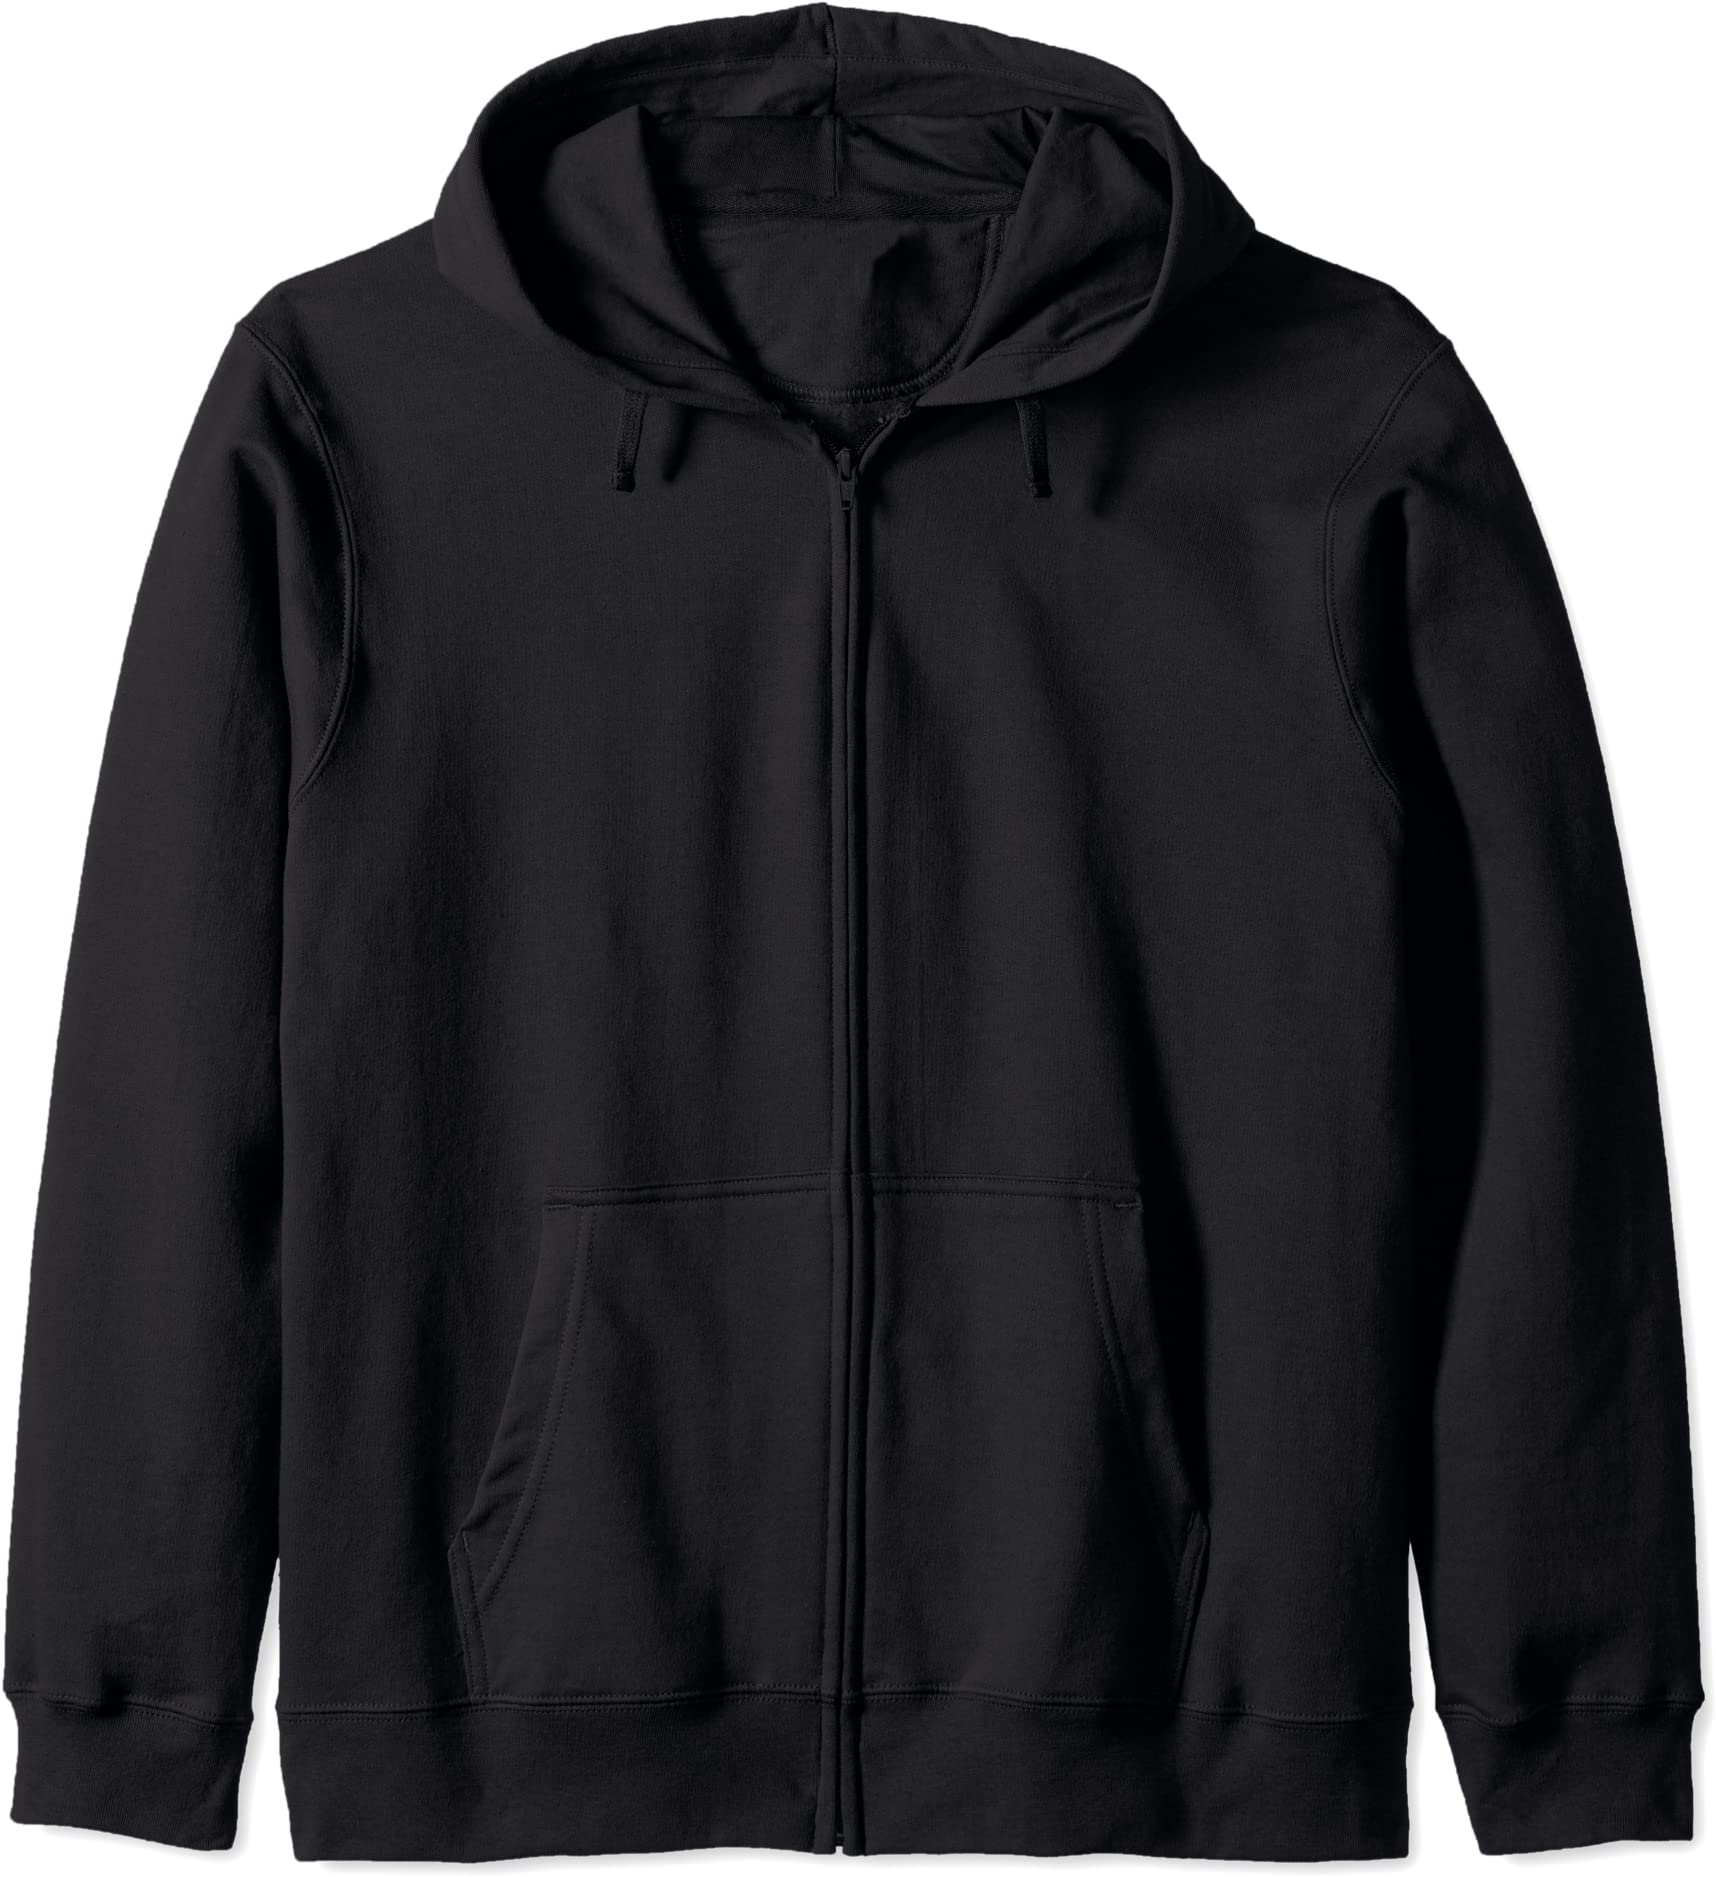 Comaba Men 3D Digital Print Pullover Funny Unisex Hoodie Sweatshirts